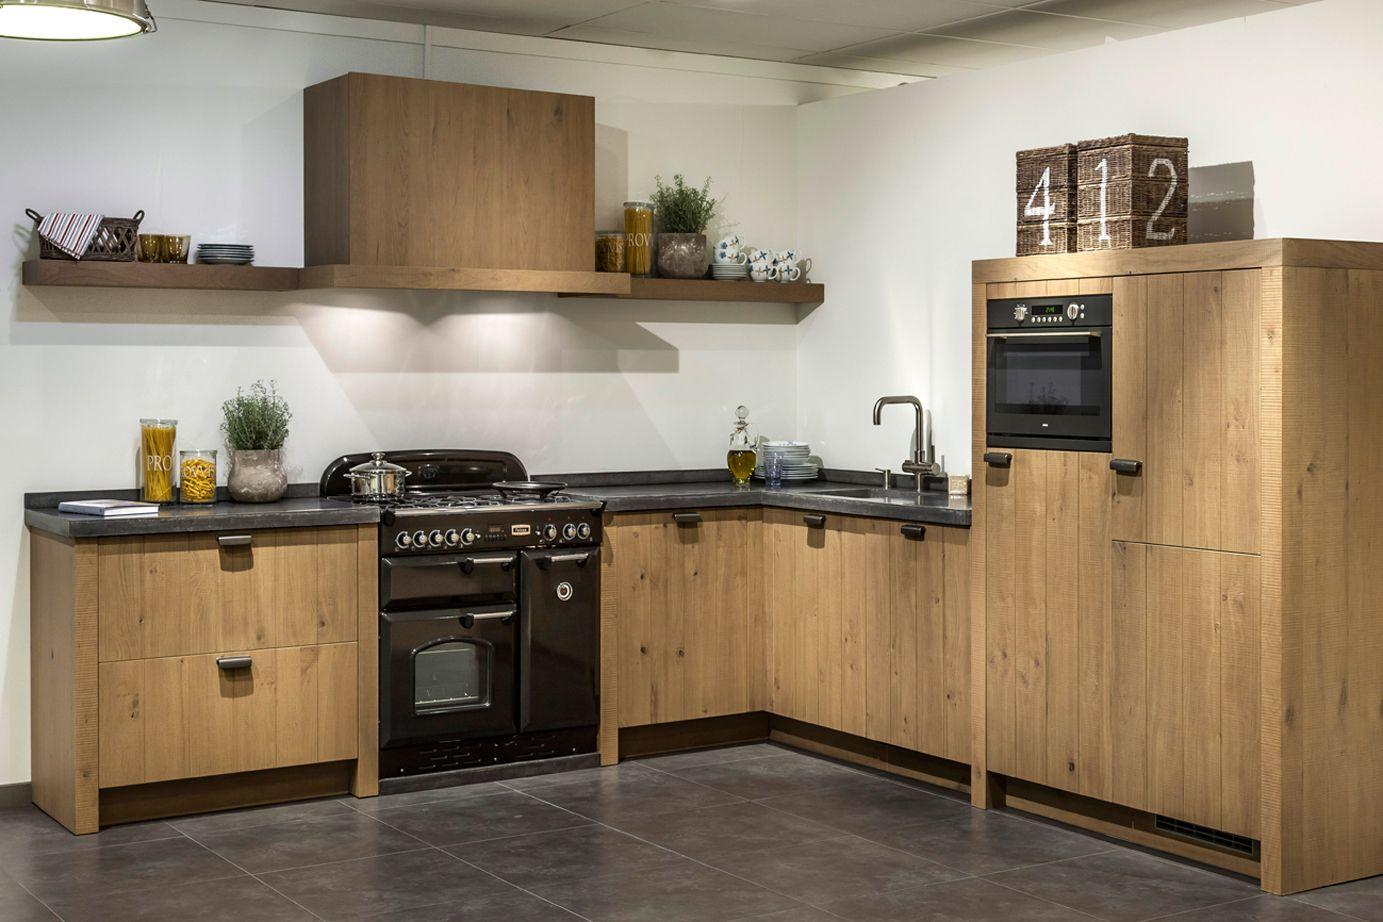 Houten Keuken Beton : Houten keuken met robuust betonnen werkblad db keukens